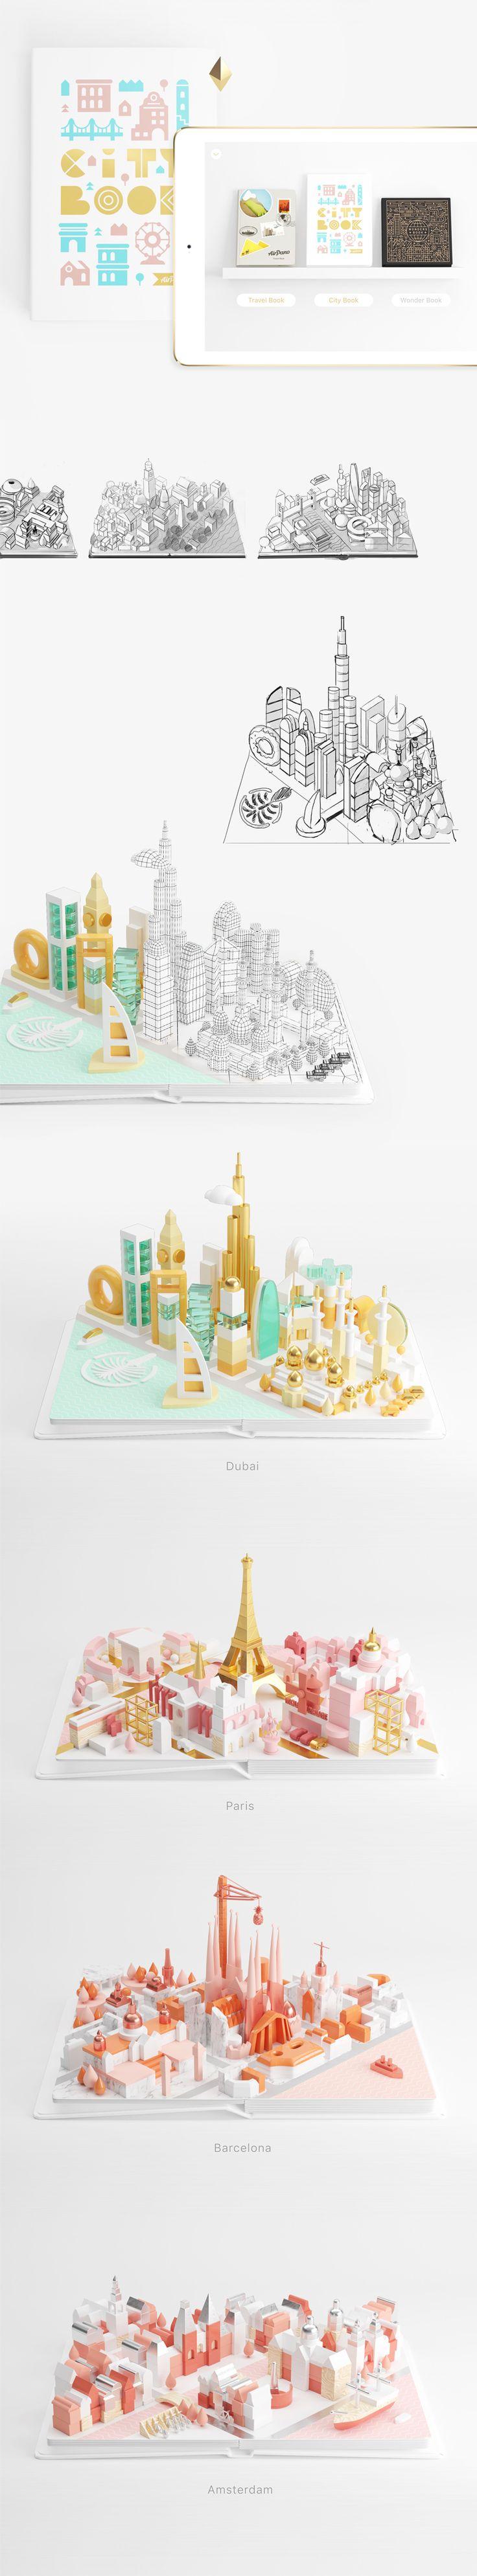 City Book App - #ui #ux #userexperience #website #webdesign #design #minimal #minimalism #art